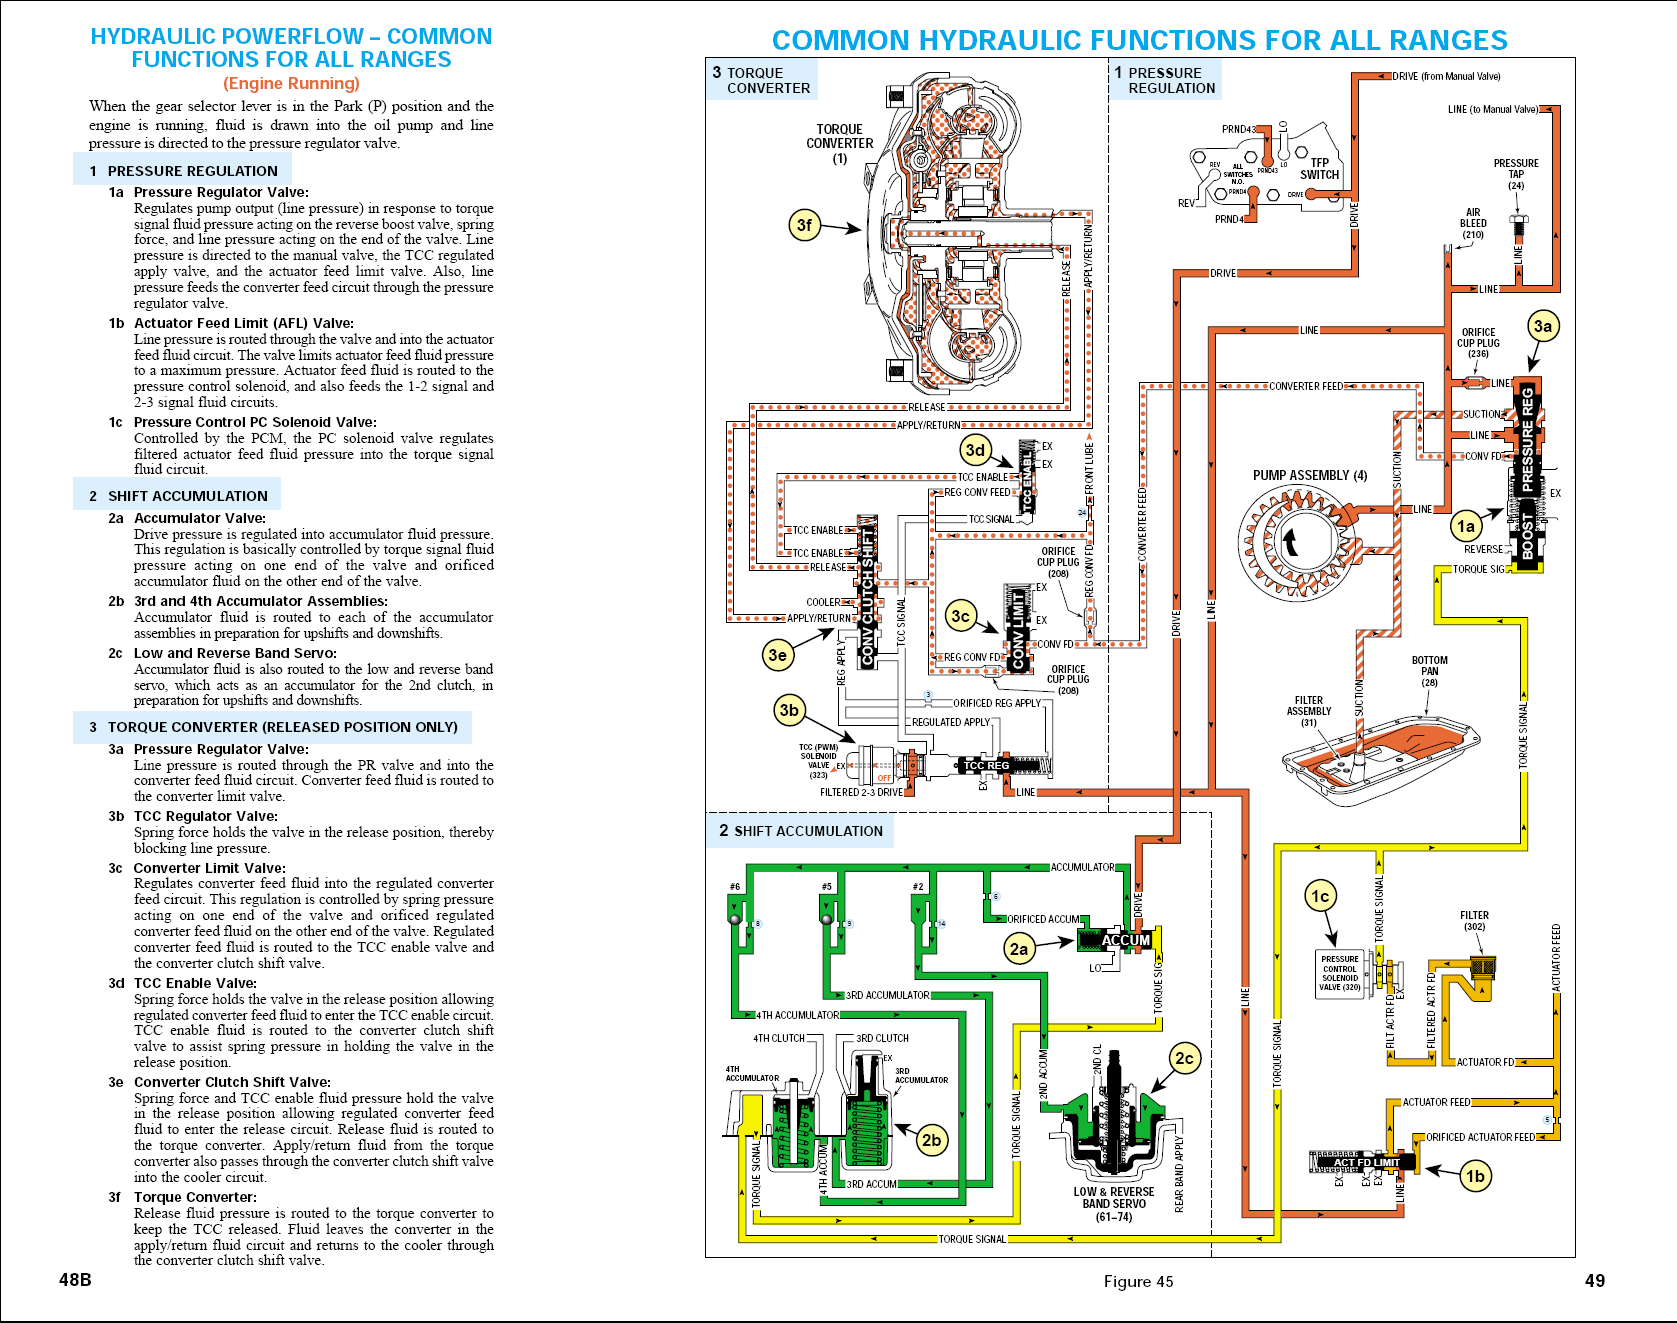 4l80 wiring diagram fire alarm control panel http truckforum org forums chevy truck forum 21157